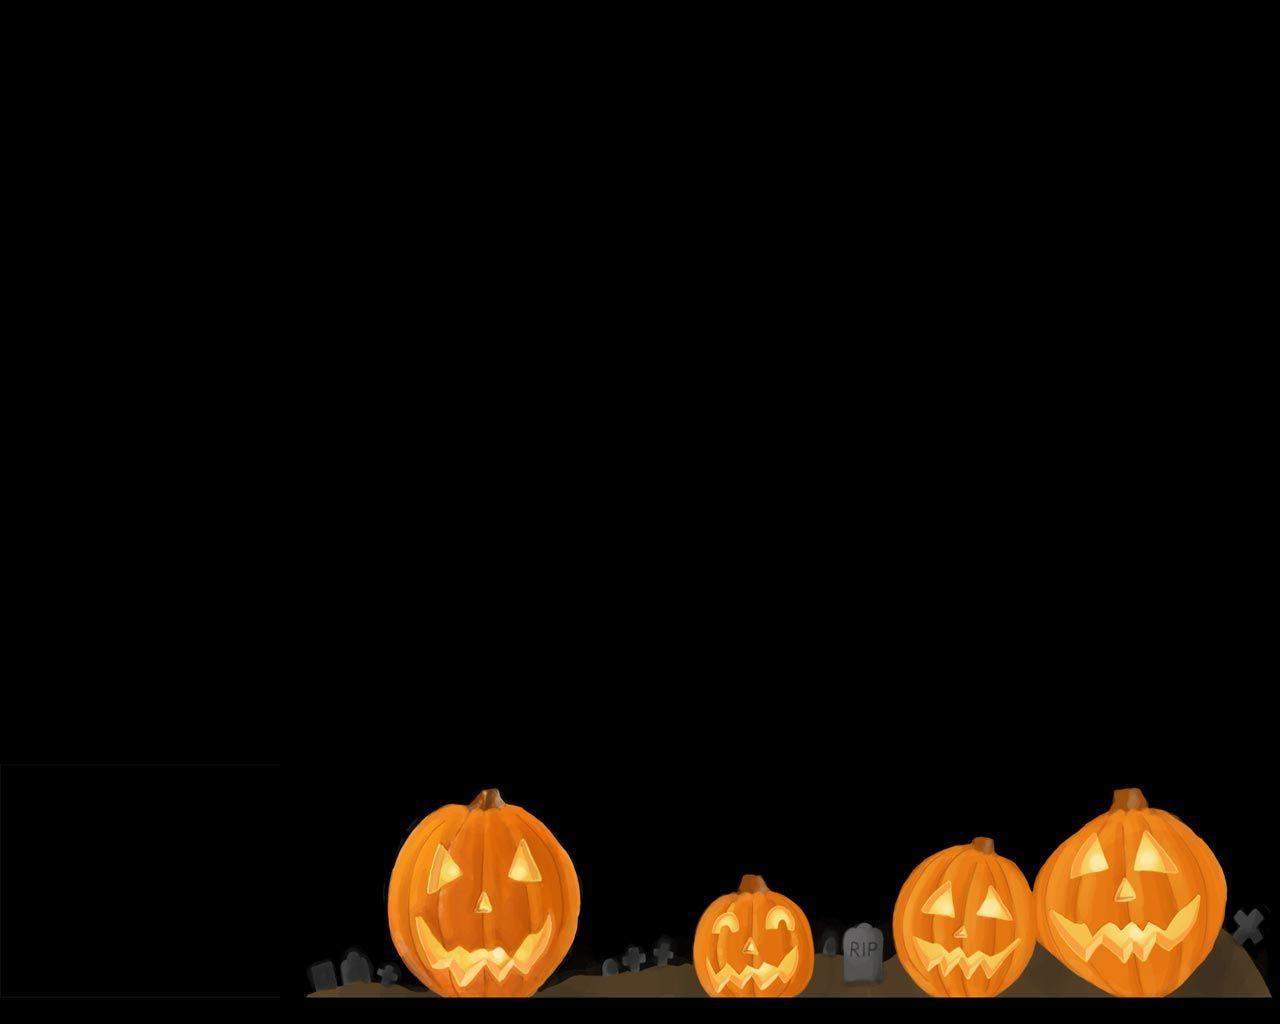 free halloween backgrounds